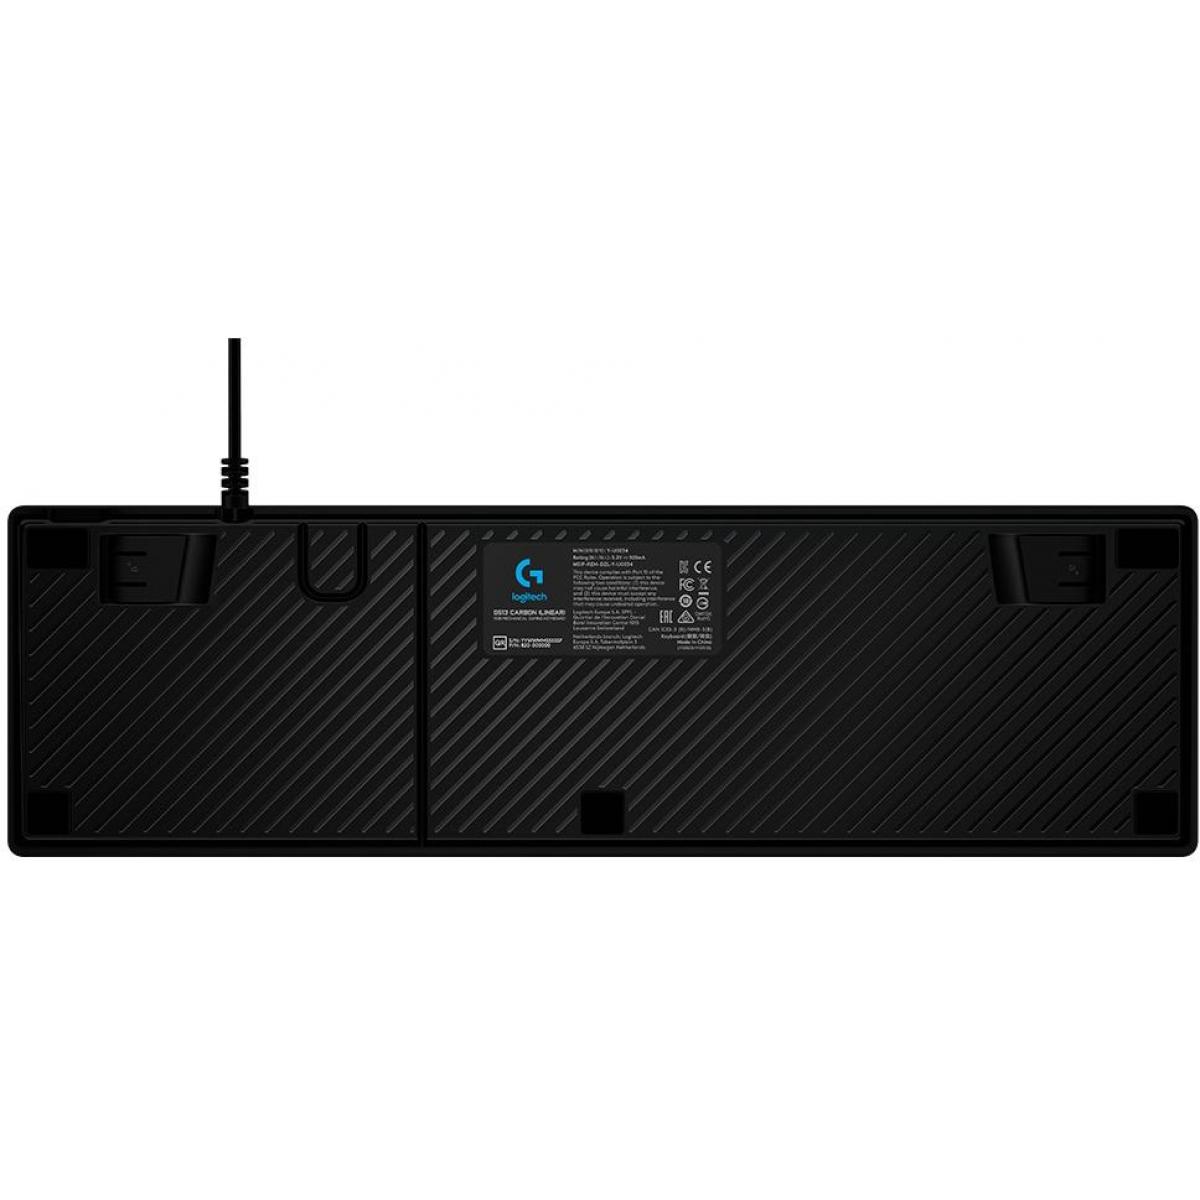 Teclado Mecânico Gamer Logitech G513 Carbon Lightsync RGB, Black